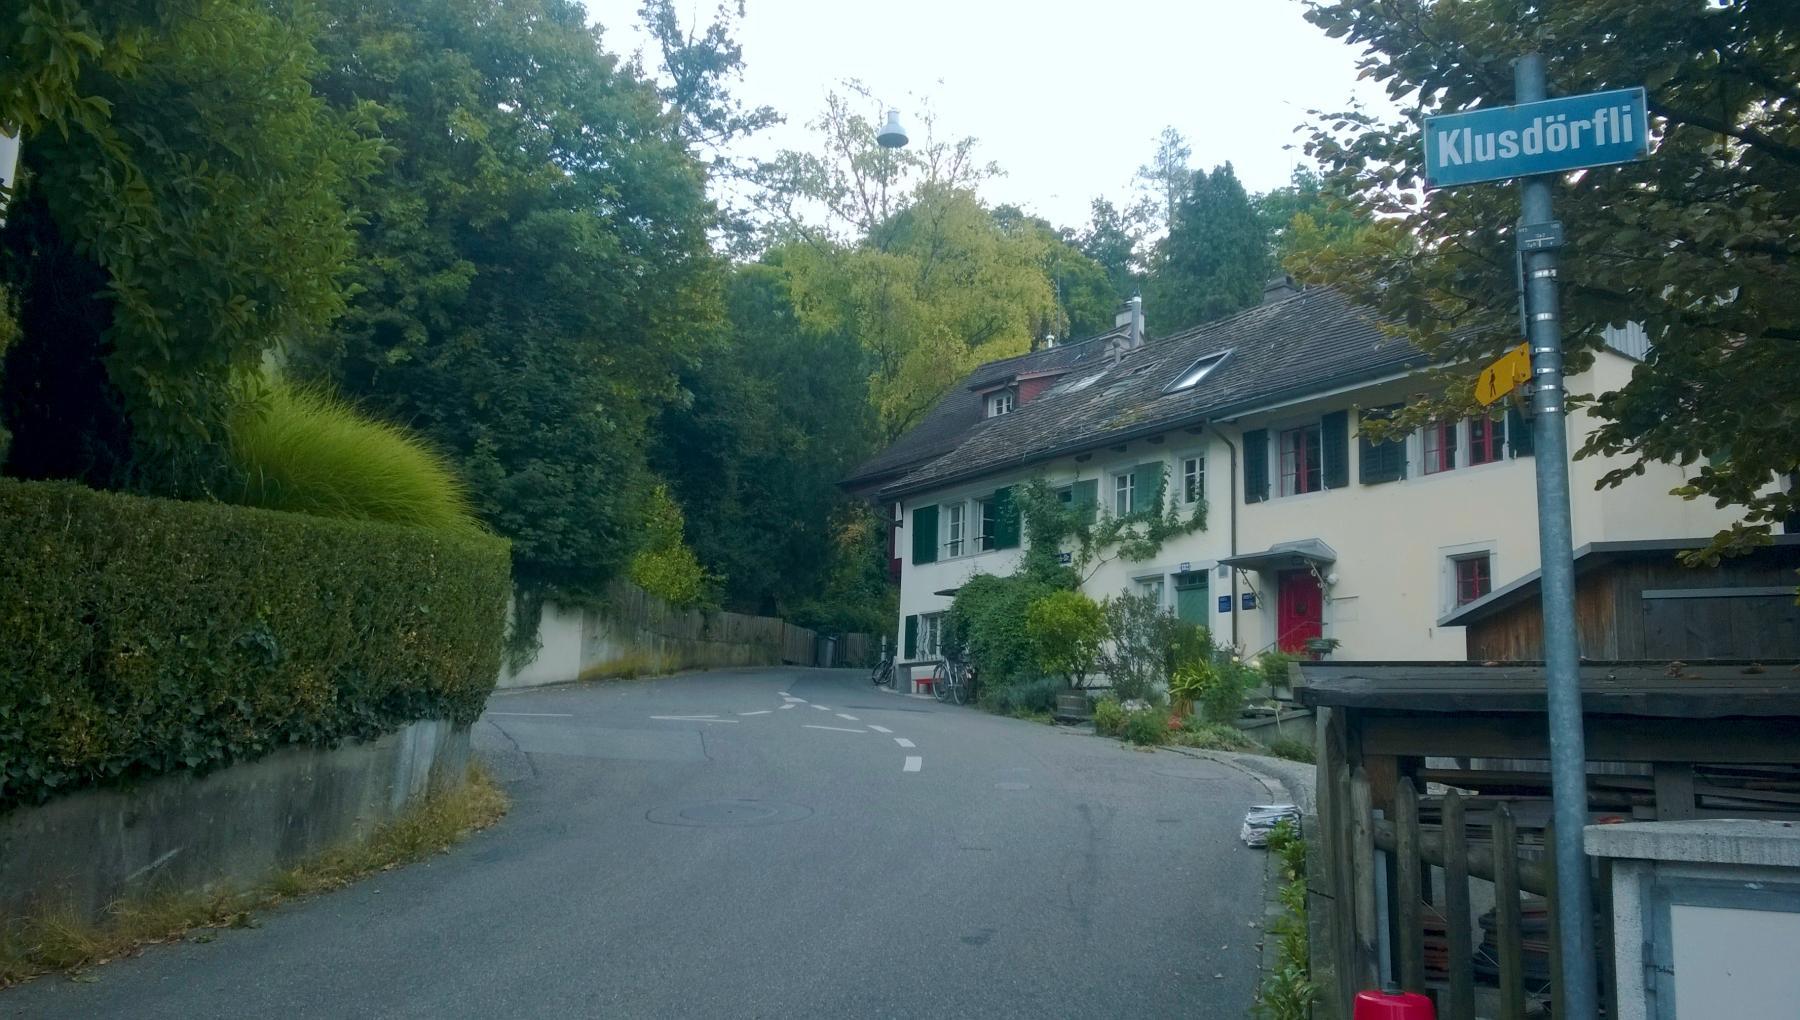 01 Hegibachstrasse/Klusdörfli